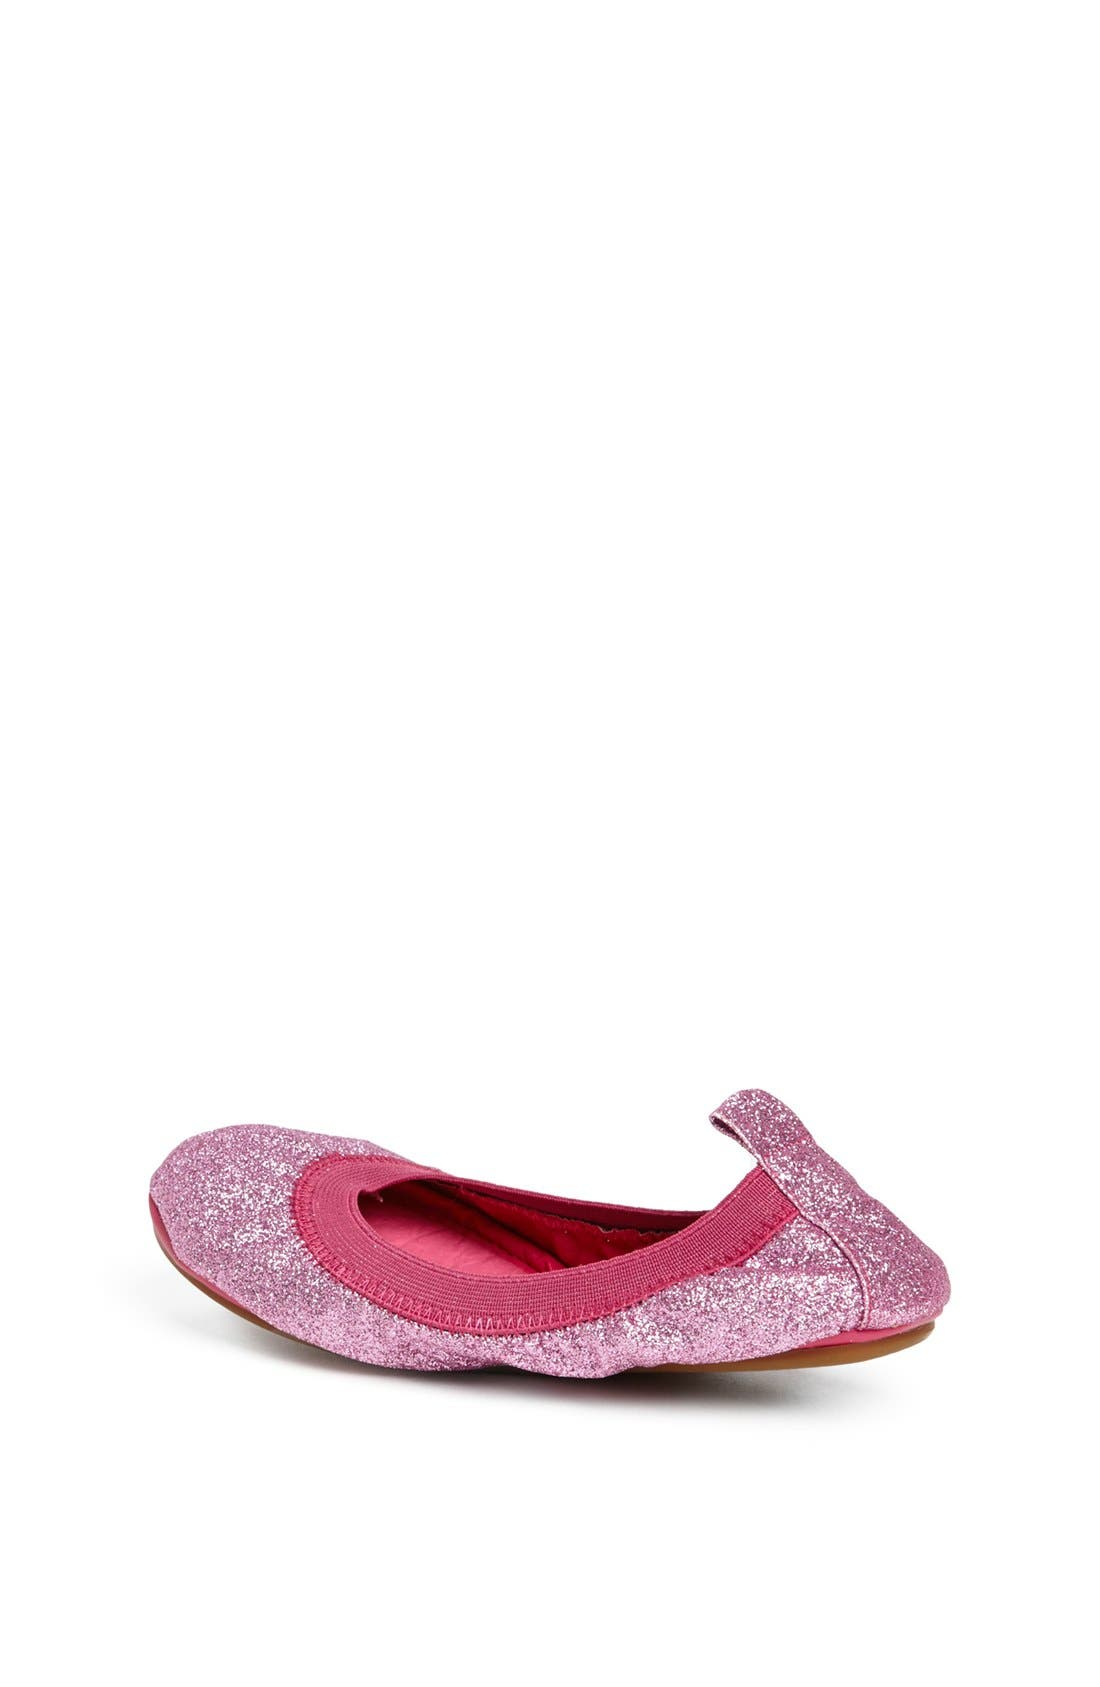 Alternate Image 2  - Yosi Samra Glitter Foldable Ballet Flat (Toddler, Little Kid & Big Kid)